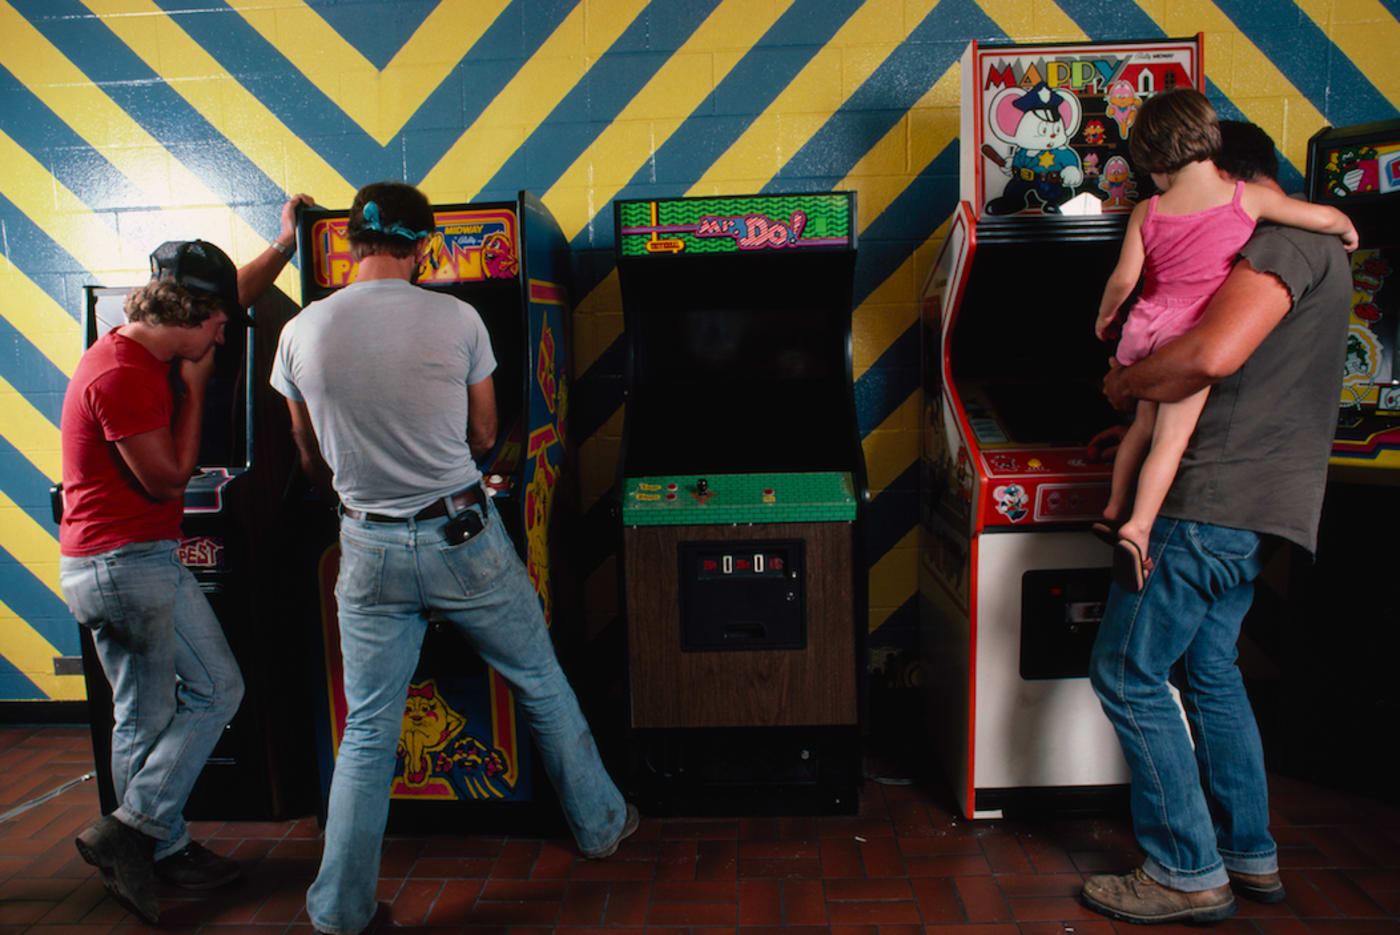 best arcade games 1990s lead